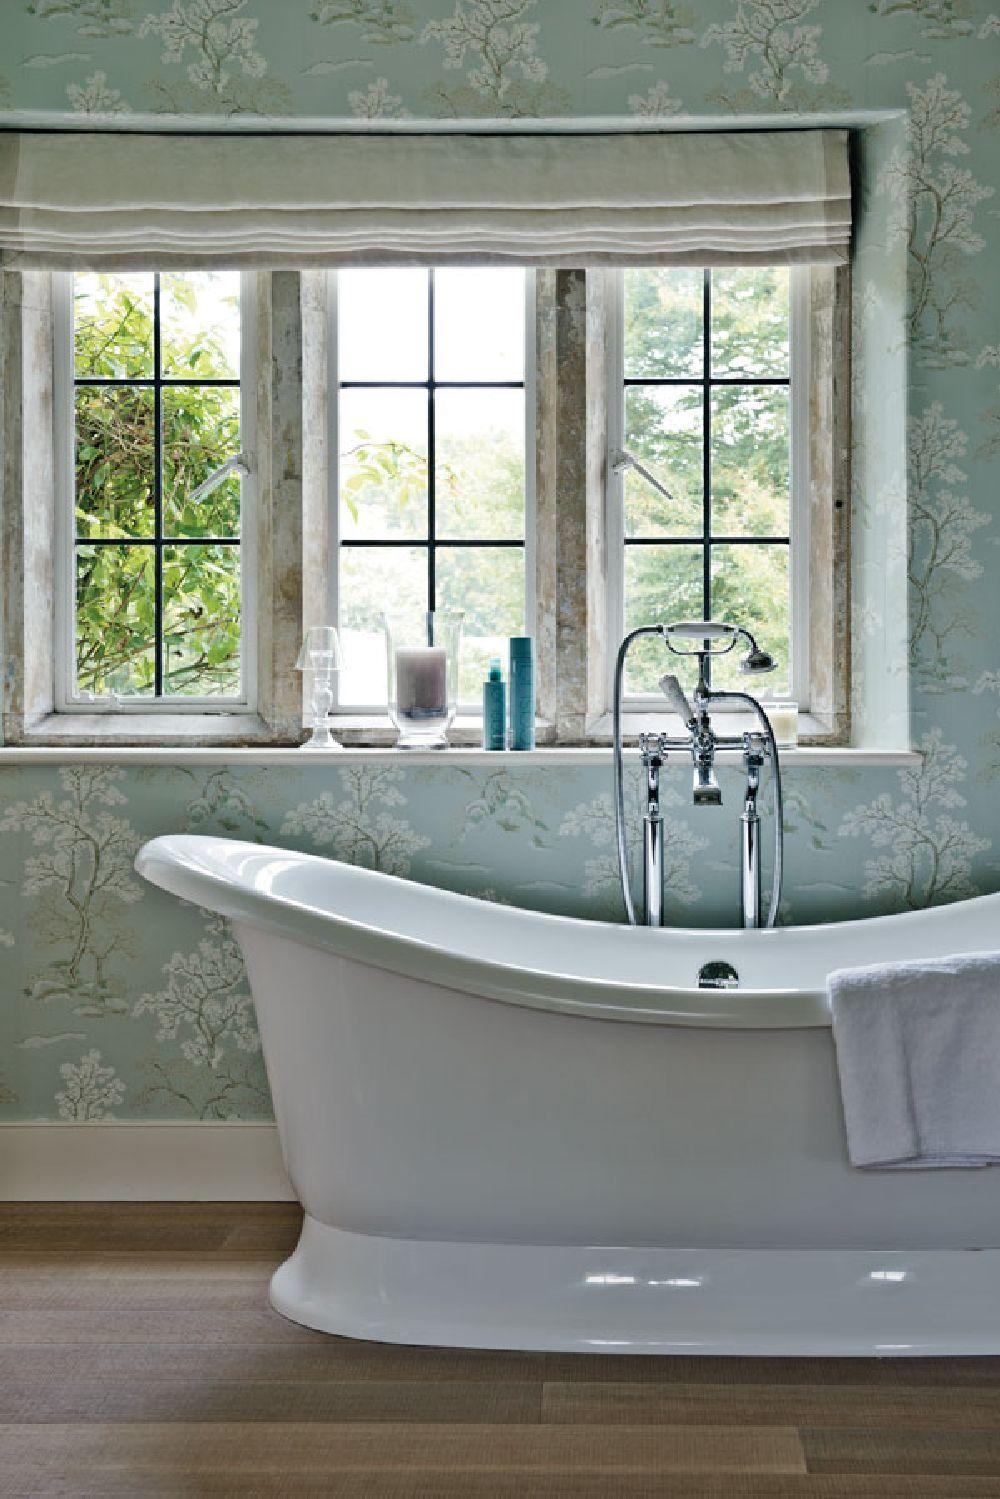 adelaparvu.com despre casa veche Anglia decorata in pasteluri, Design Interior Sims Hilditch Interior Design, Dorset Manor House, Foto Polly Eltes (9)